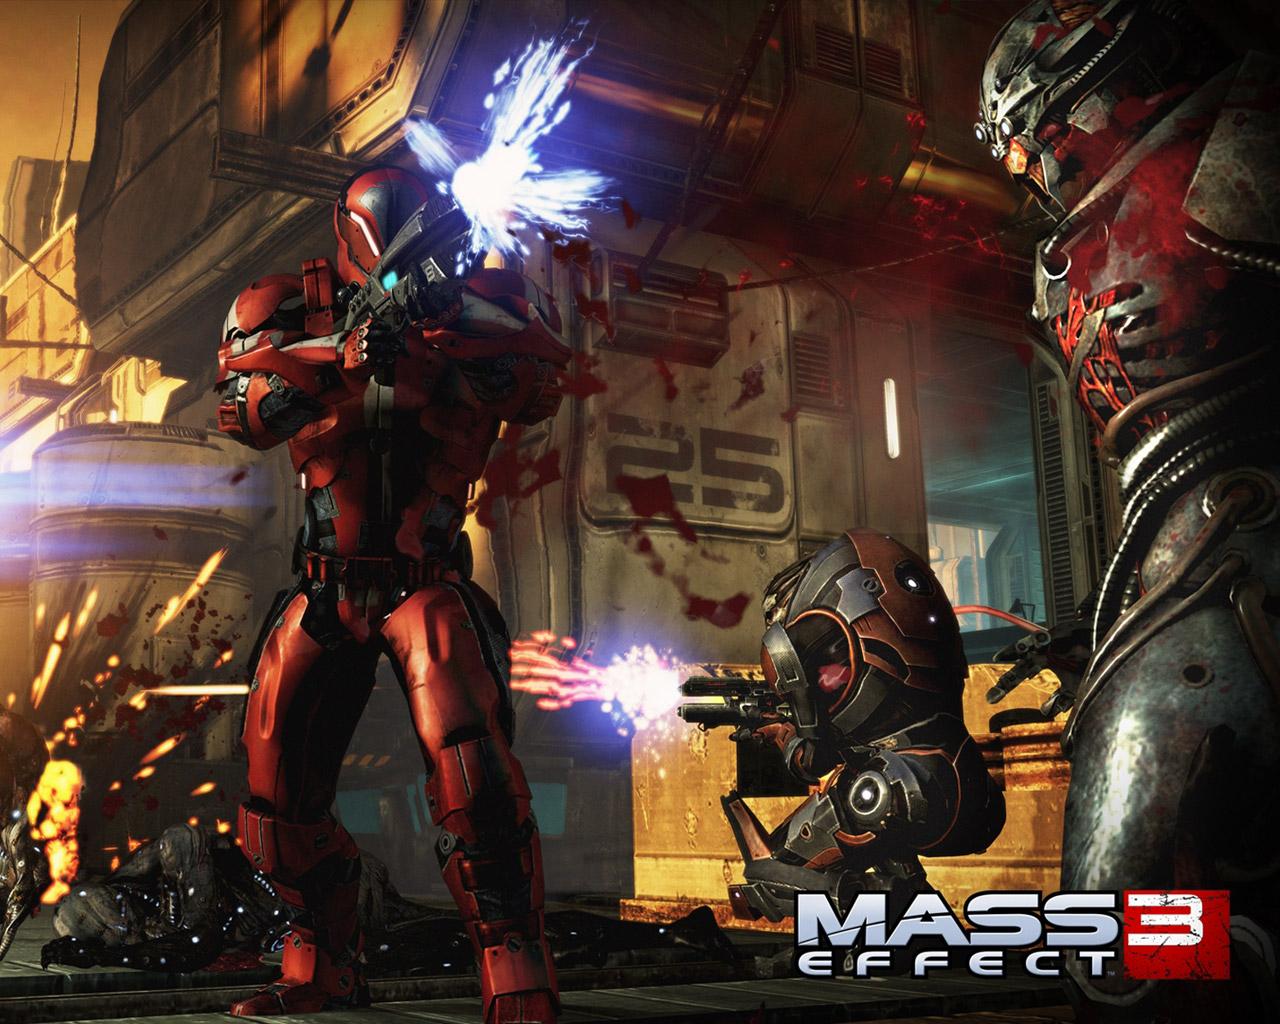 Free Mass Effect 3 Wallpaper in 1280x1024